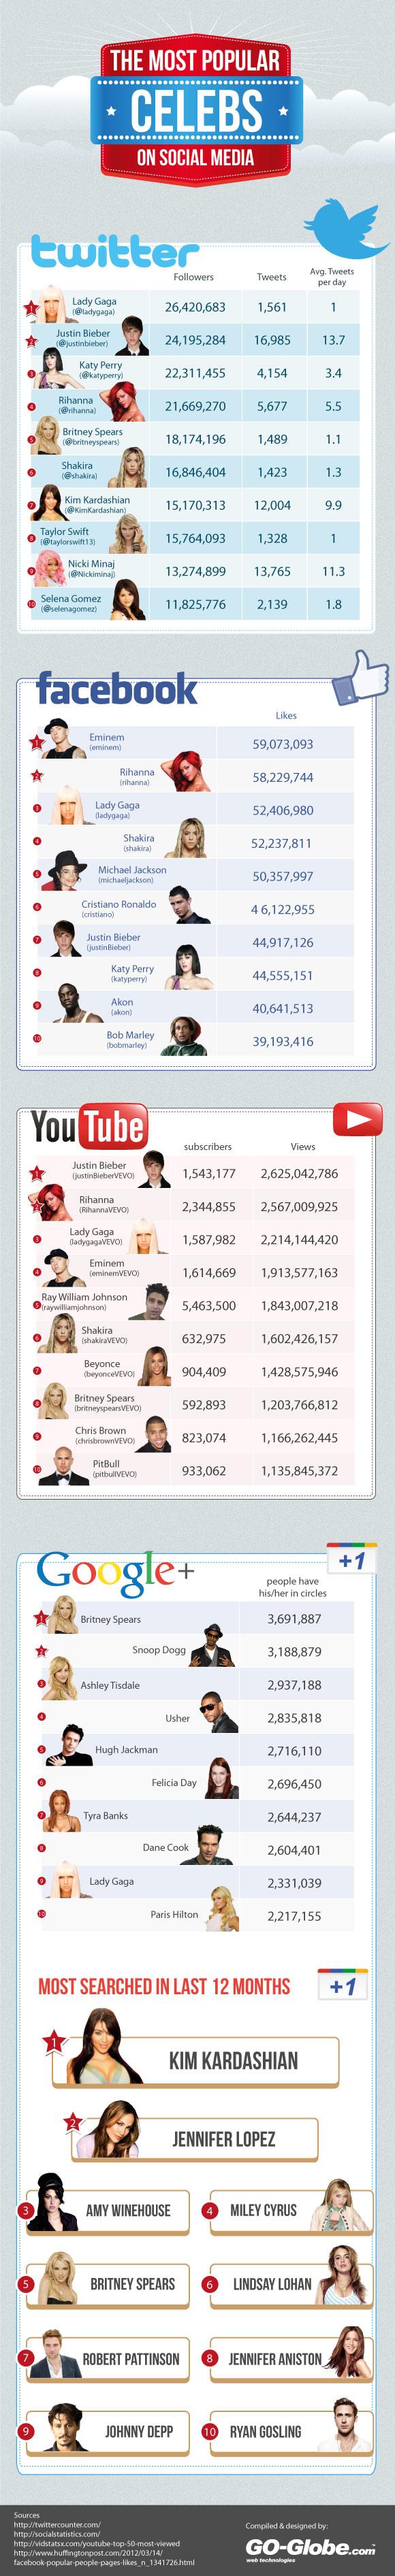 Celebrities-On-Social-Media-infographic